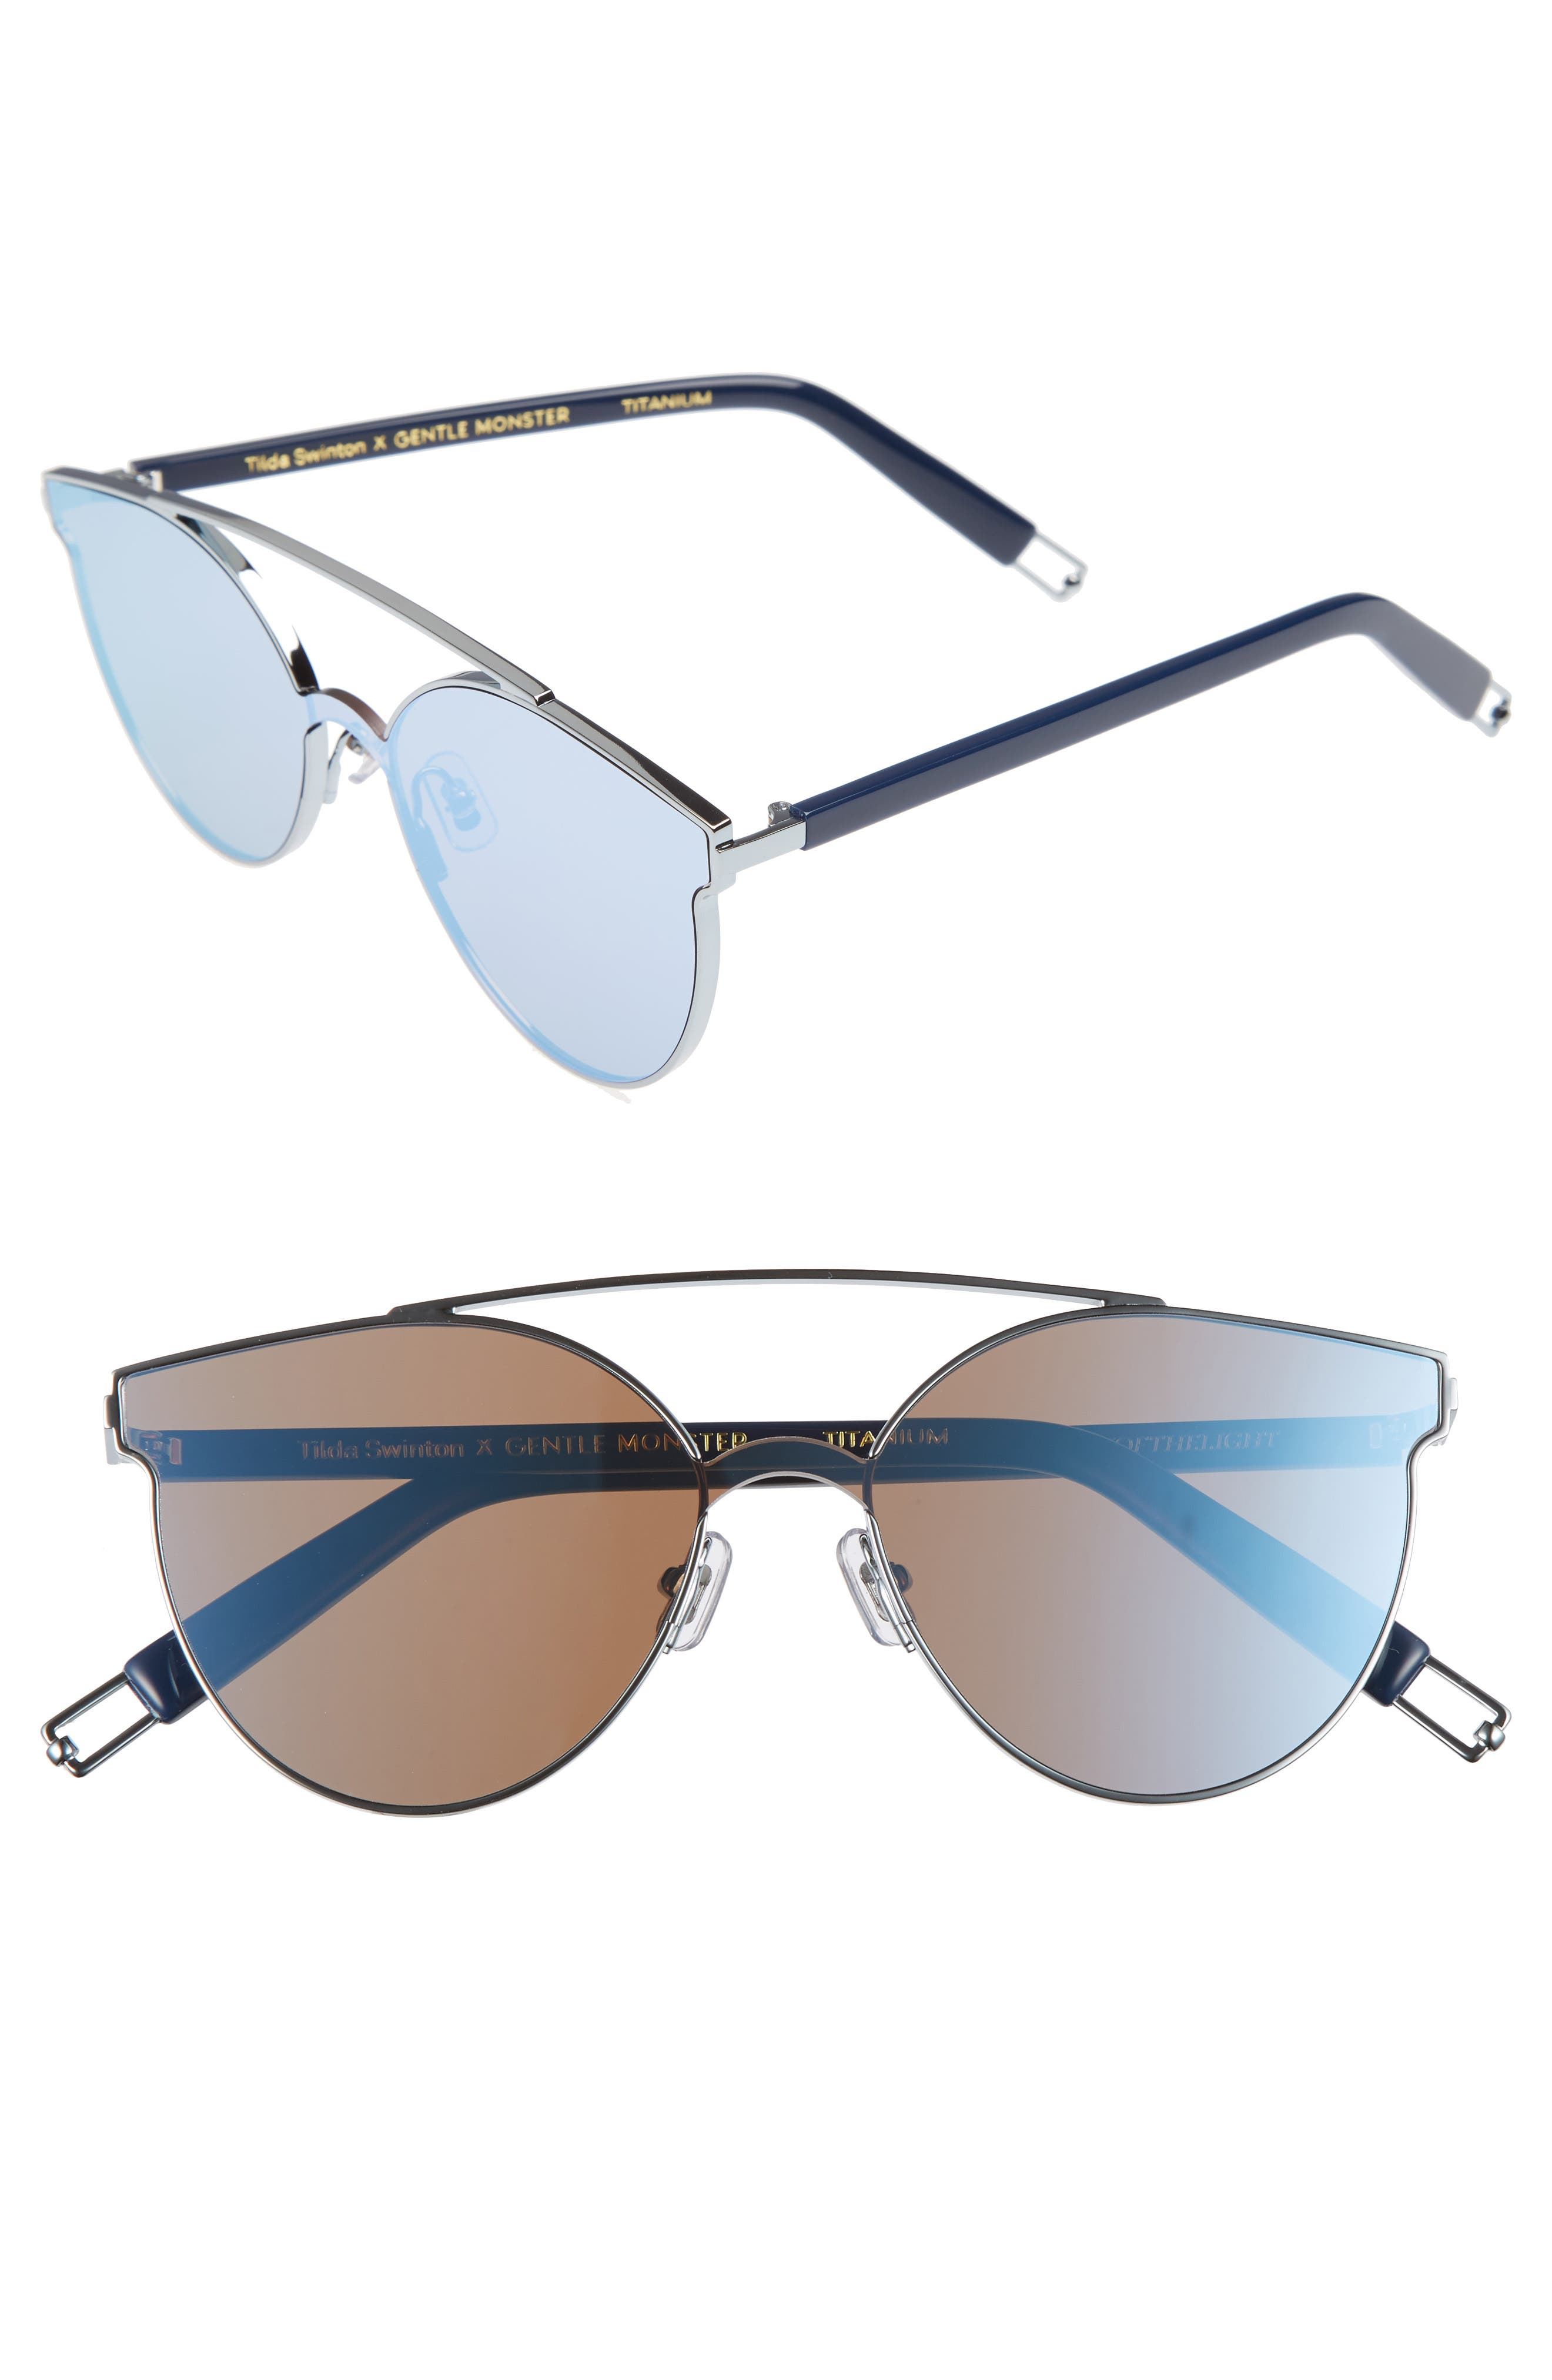 Tilda Swinton x Gentle Monster Trick of the Light 60mm Shield Sunglasses,                         Main,                         color, Blue Mirror